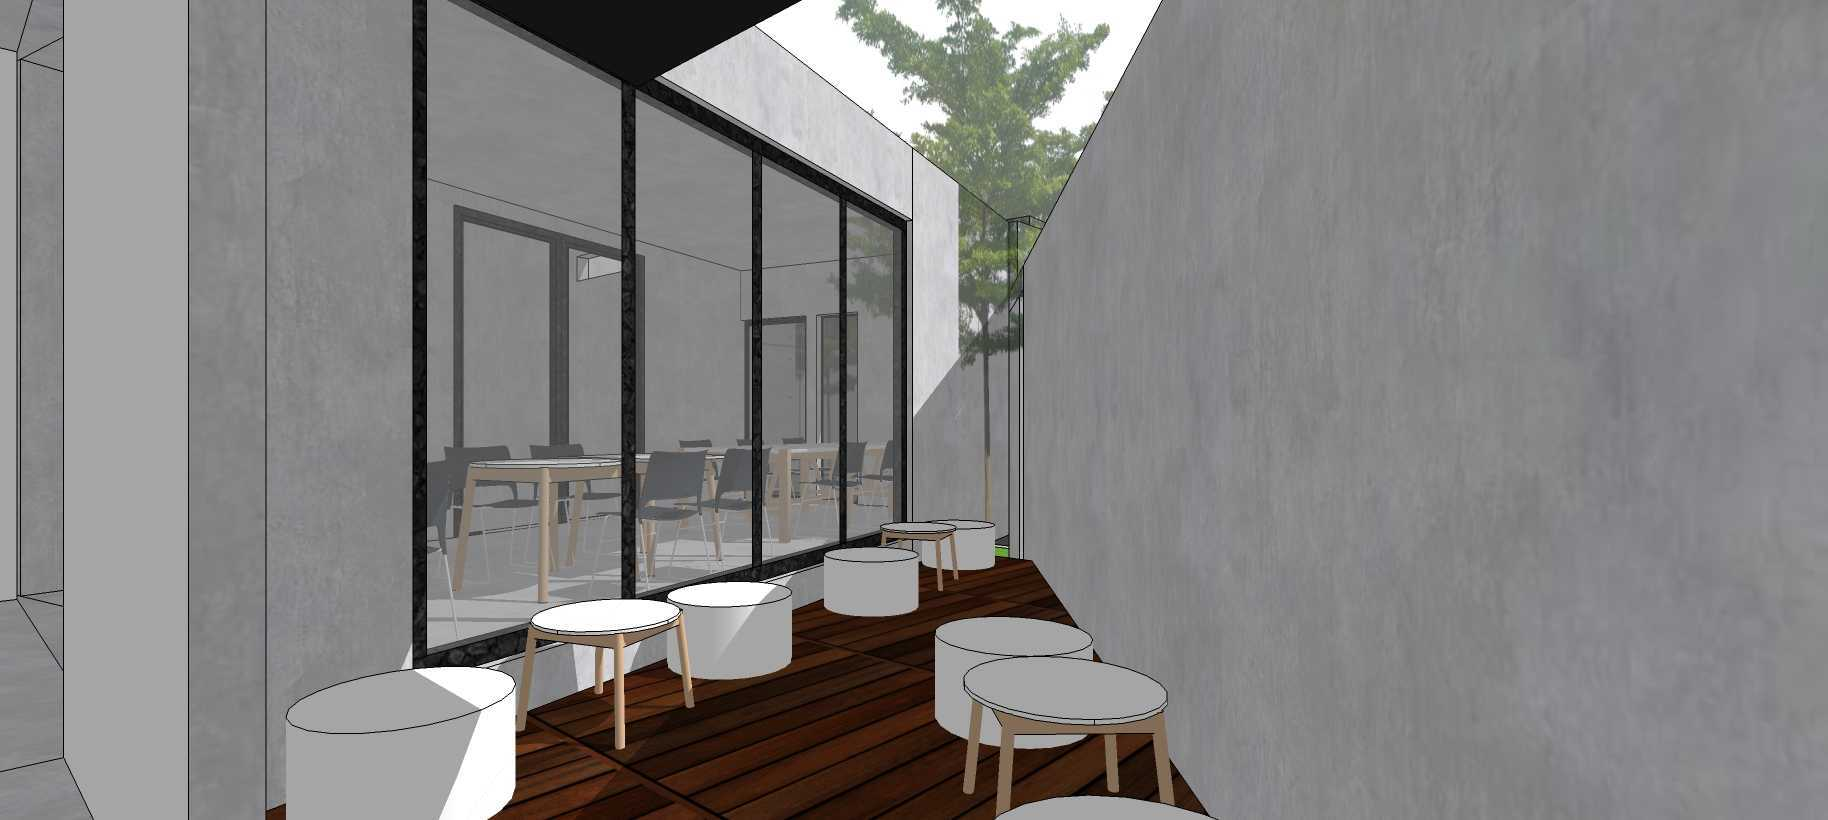 Rca  Architect Cafe At Pleburan Semarang Semarang, Kota Semarang, Jawa Tengah, Indonesia Semarang, Kota Semarang, Jawa Tengah, Indonesia Rangga-Cahya-Cafe-At-Pleburan-Semarang  116494